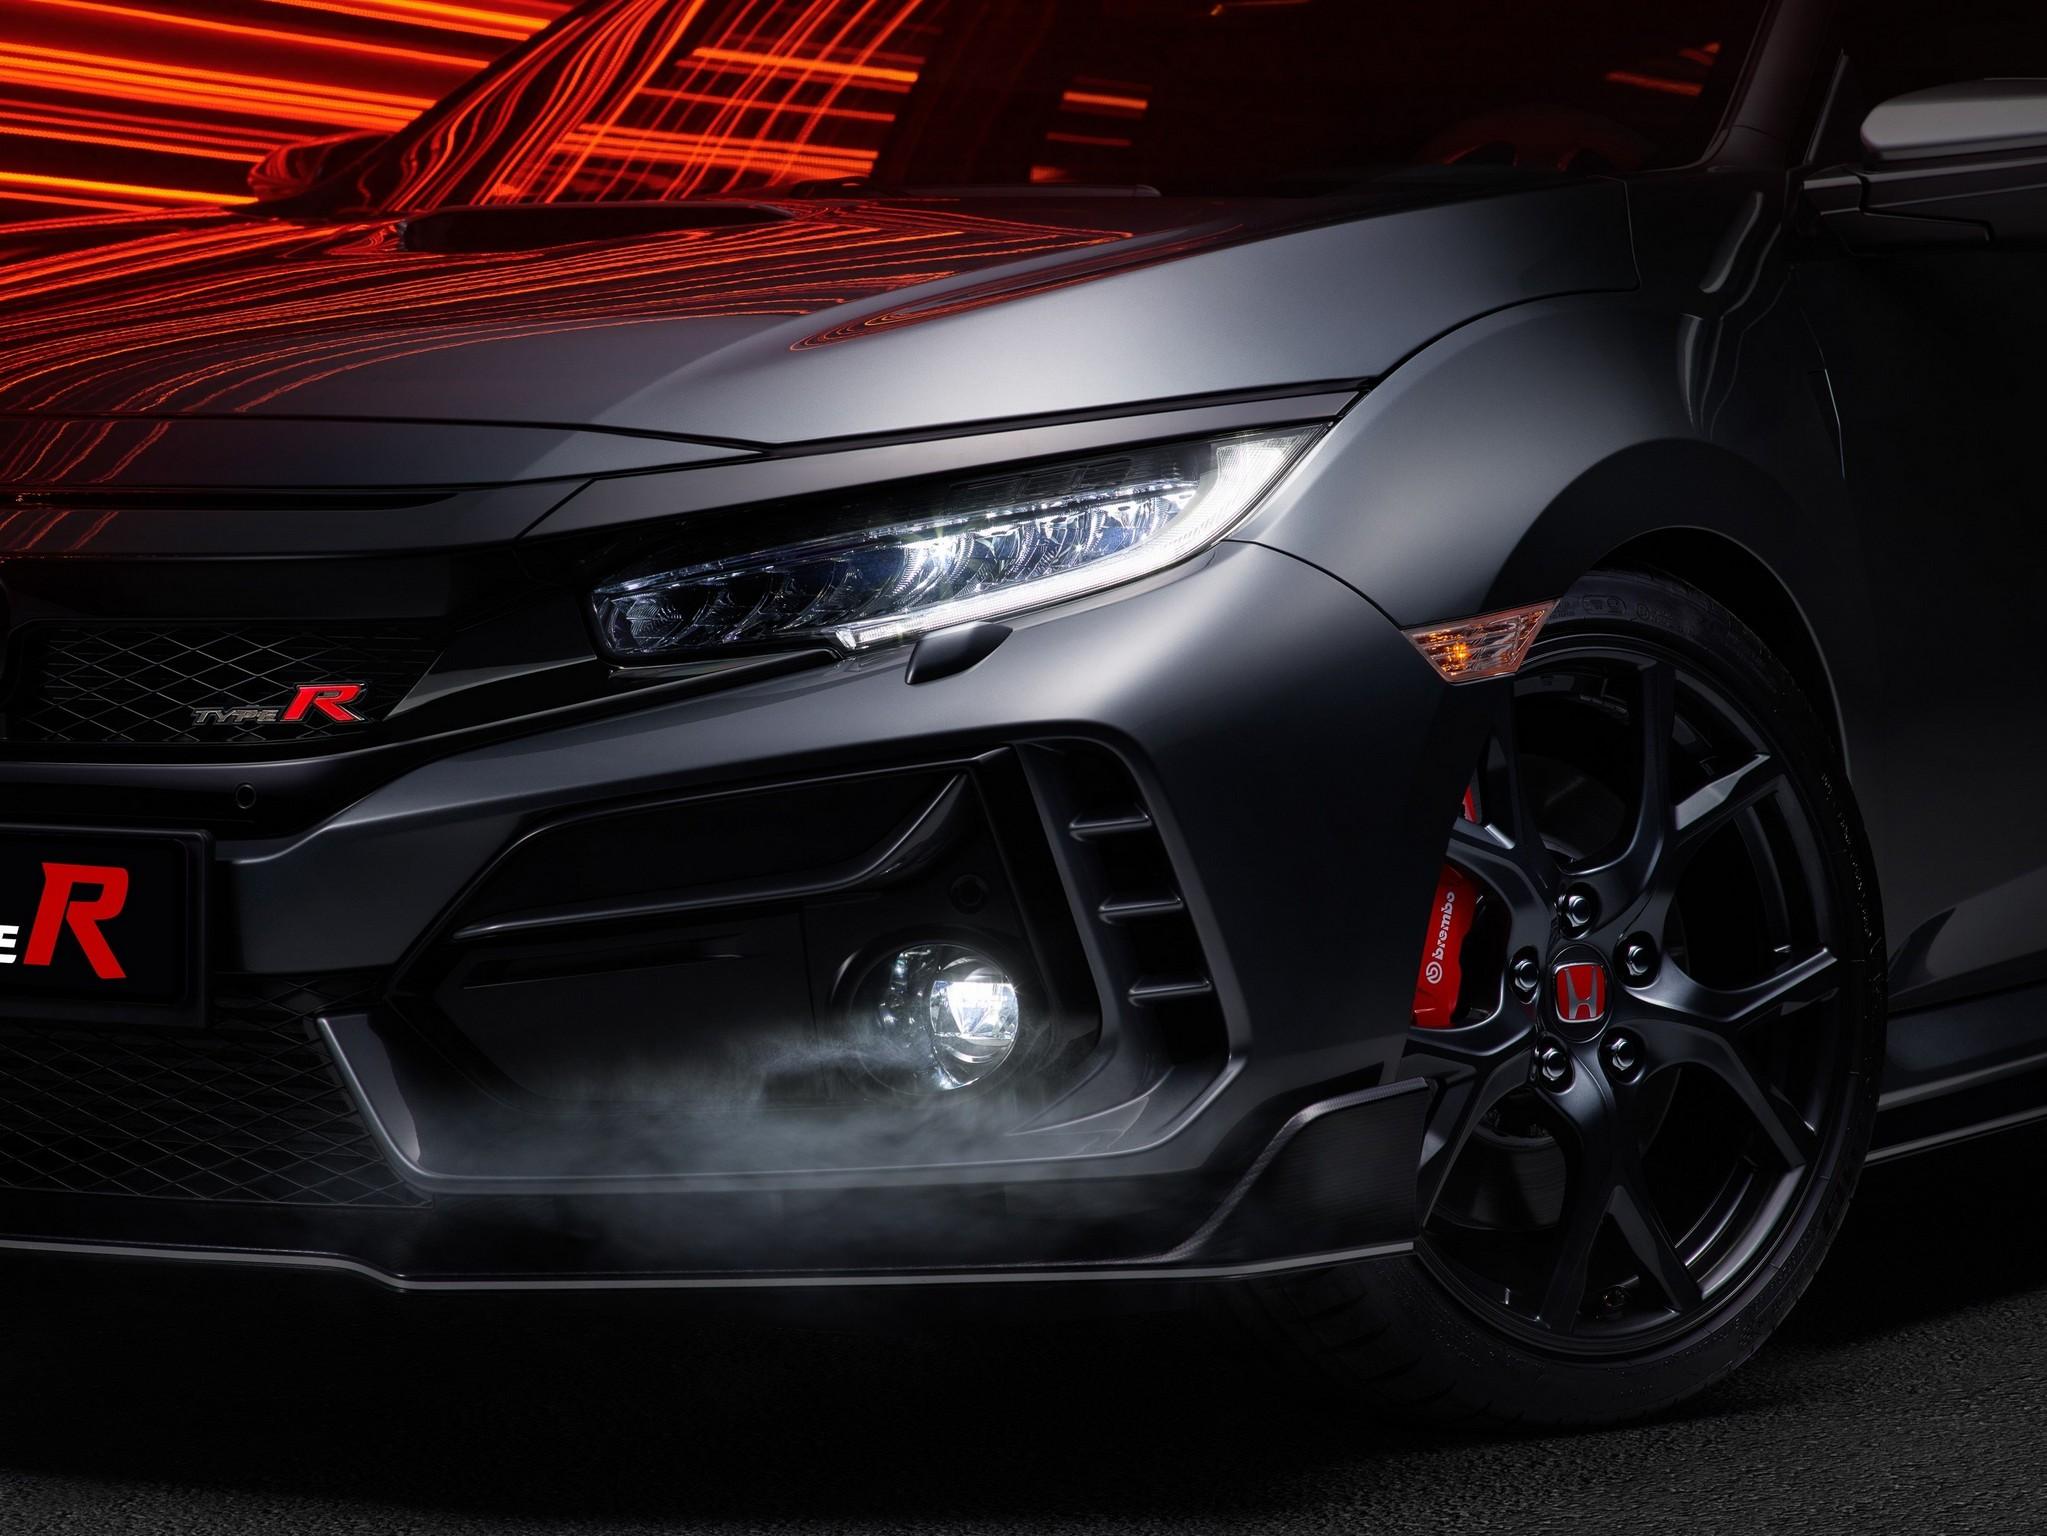 2020 Civic Type R Sport Line